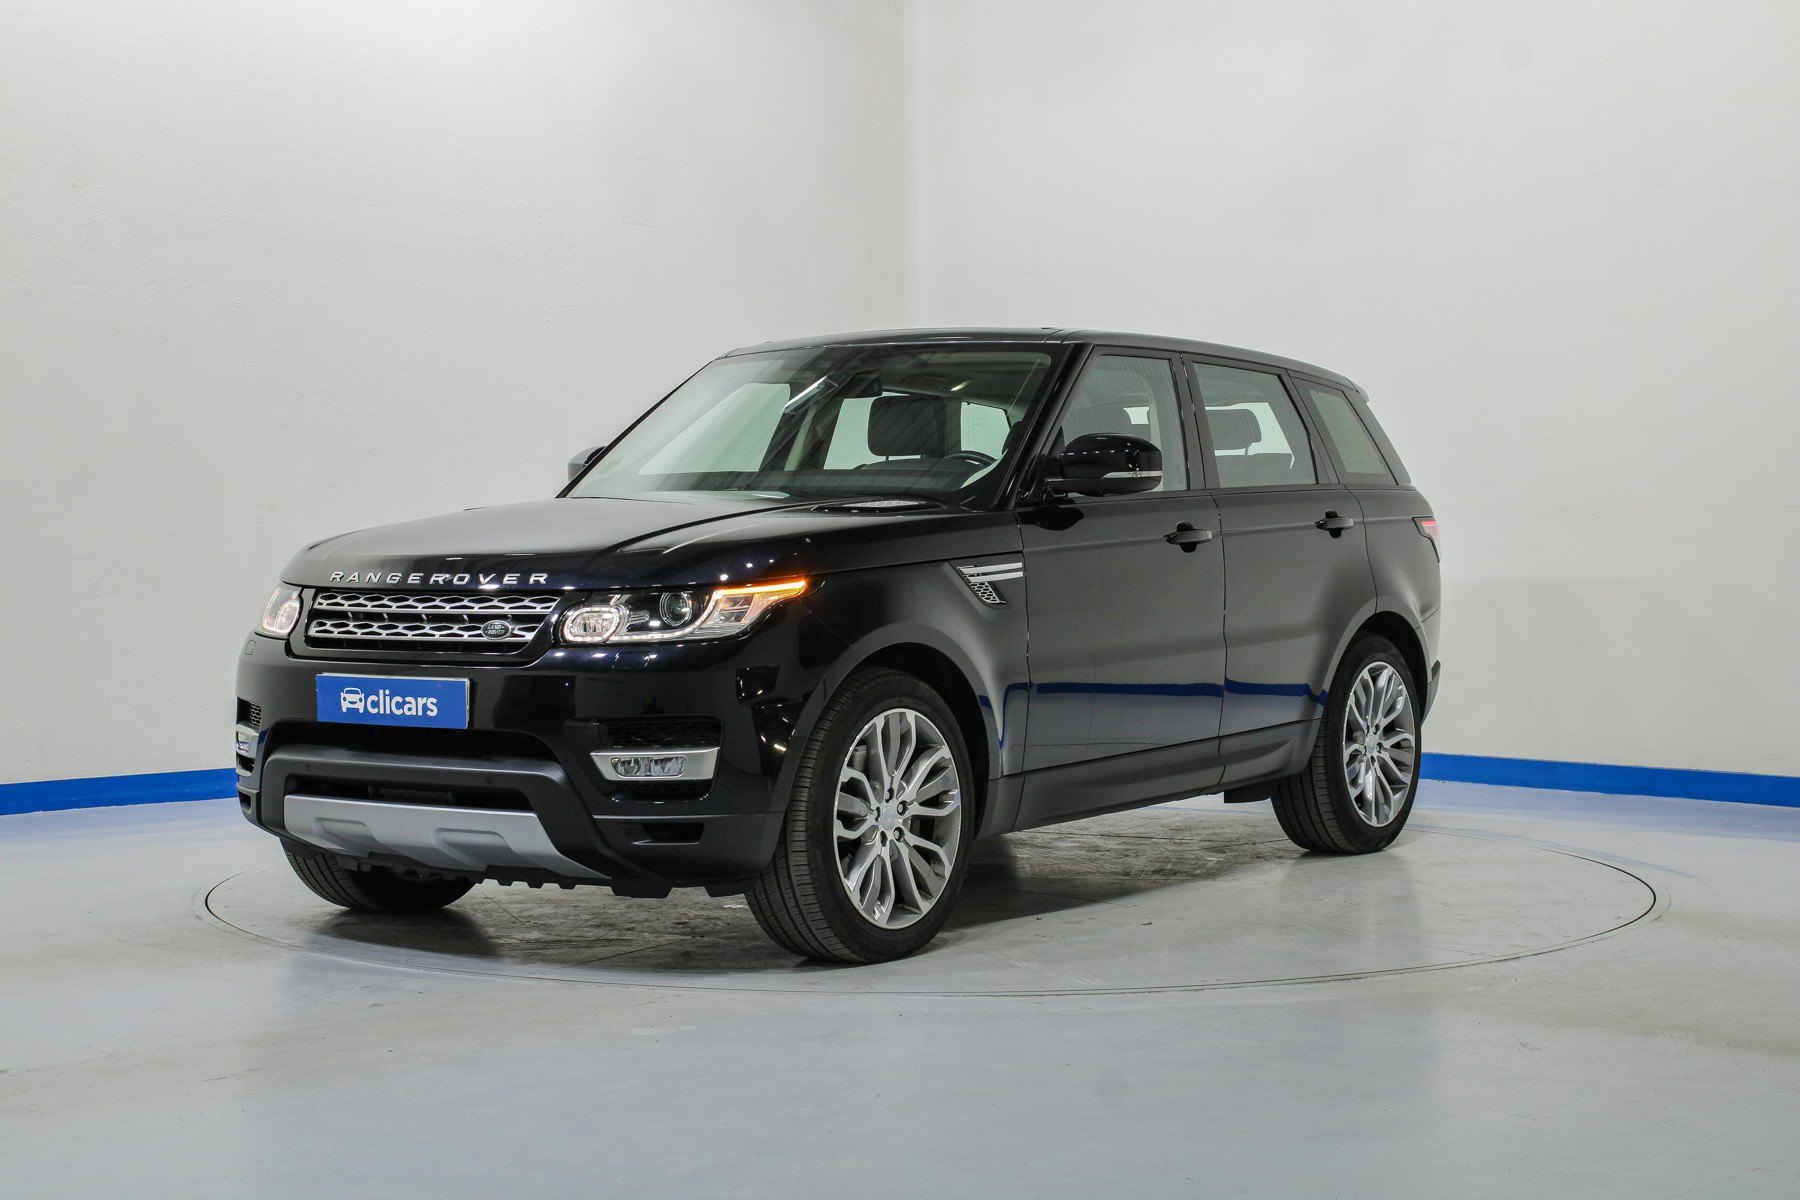 Land Rover Range Rover Sport Diésel 3.0 SDV6 225kW (306CV) HSE 1